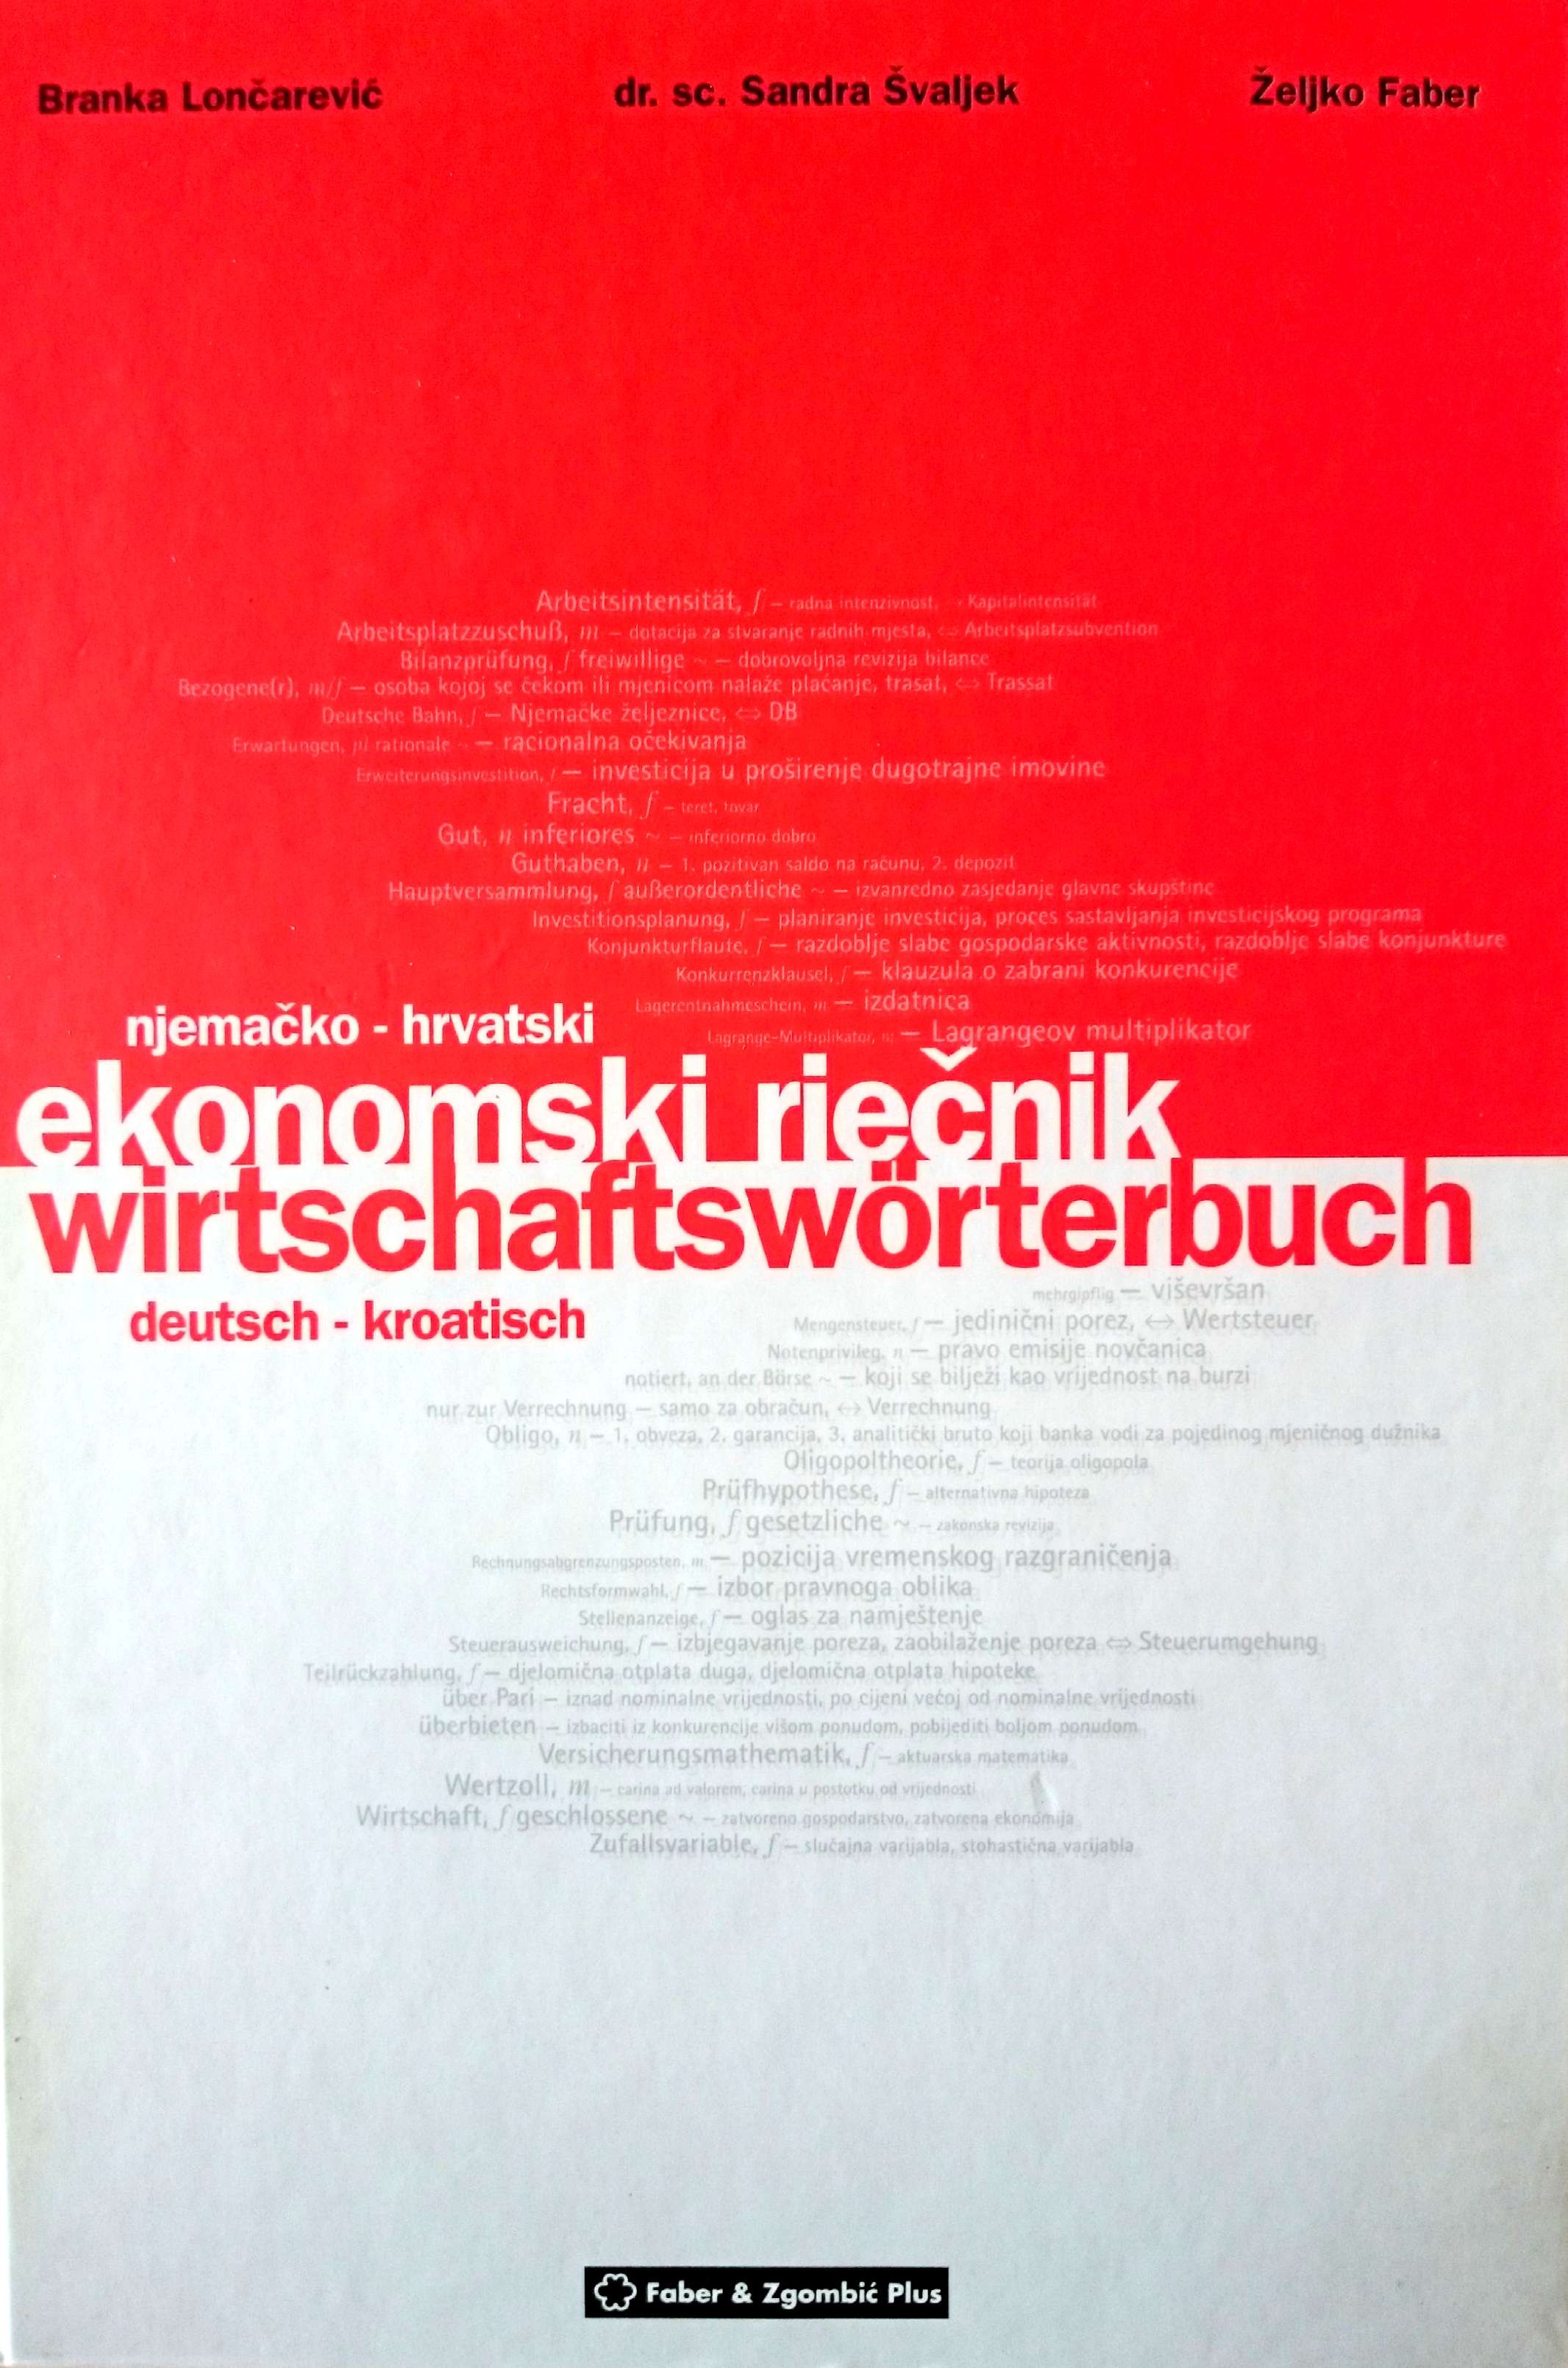 NJEMAČKO-HRVATSKI EKONOMSKI RJEČNIK / WIRTSCHAFTSWÖRERBUCH DEUTSCH-KROATISCH - Naruči svoju knjigu